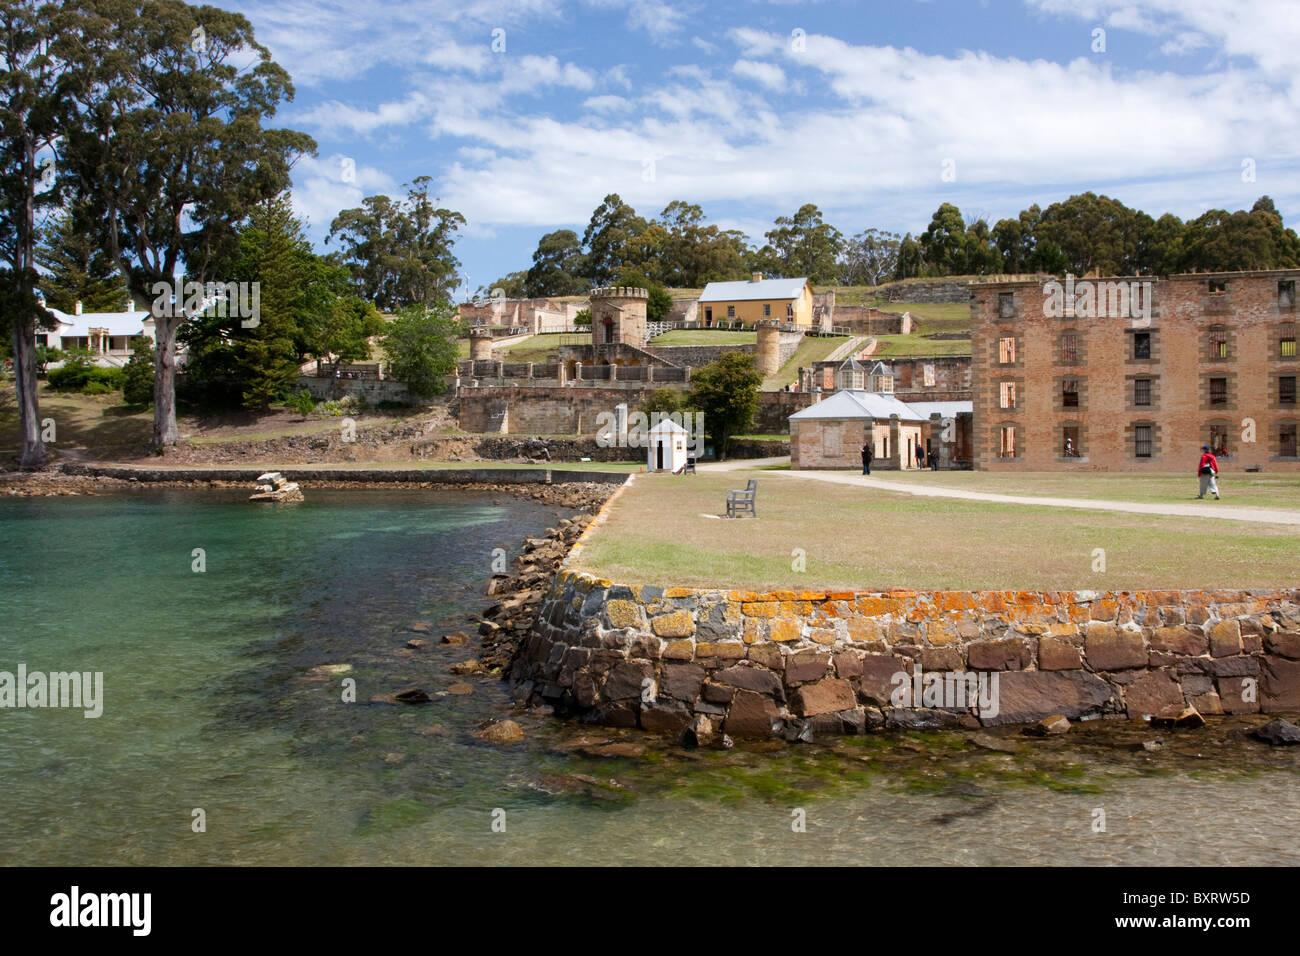 Australien, Tasmanien, Tasman Halbinsel, Port Arthur, Blick auf Gebäude der Gedenkstätte Stockbild